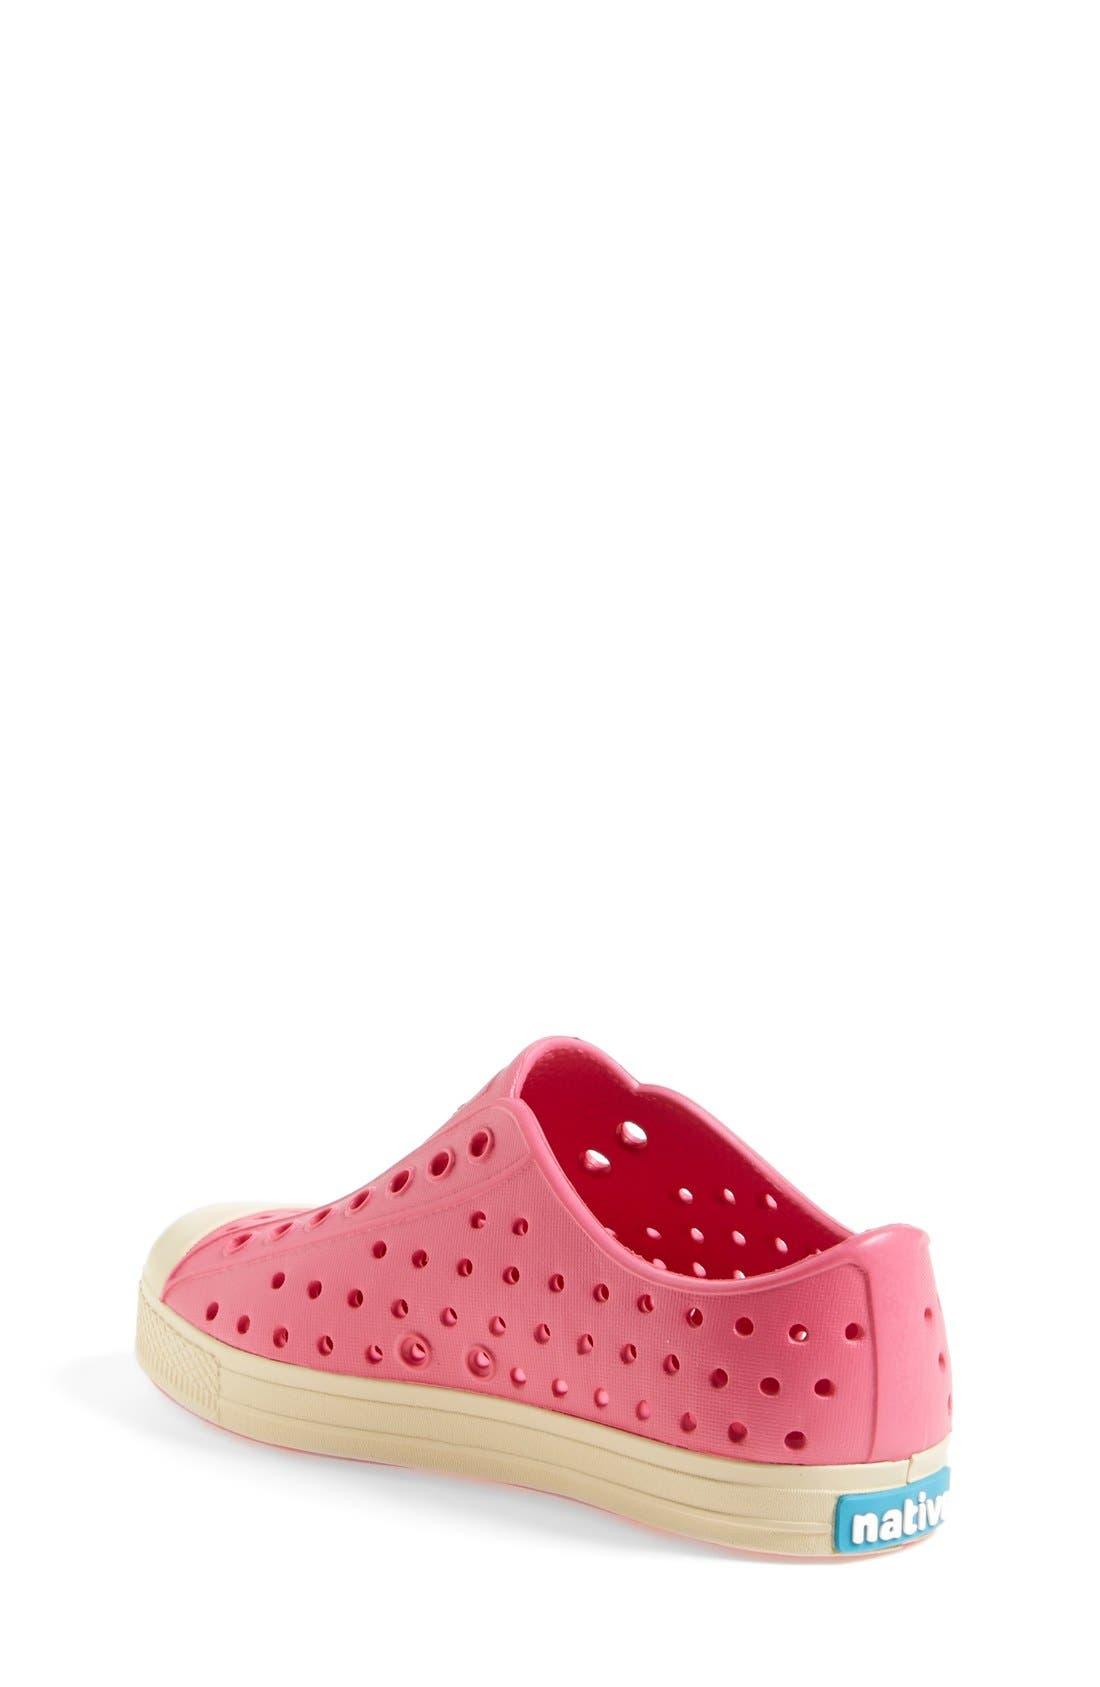 'Jefferson' Water Friendly Slip-On Sneaker,                             Alternate thumbnail 115, color,